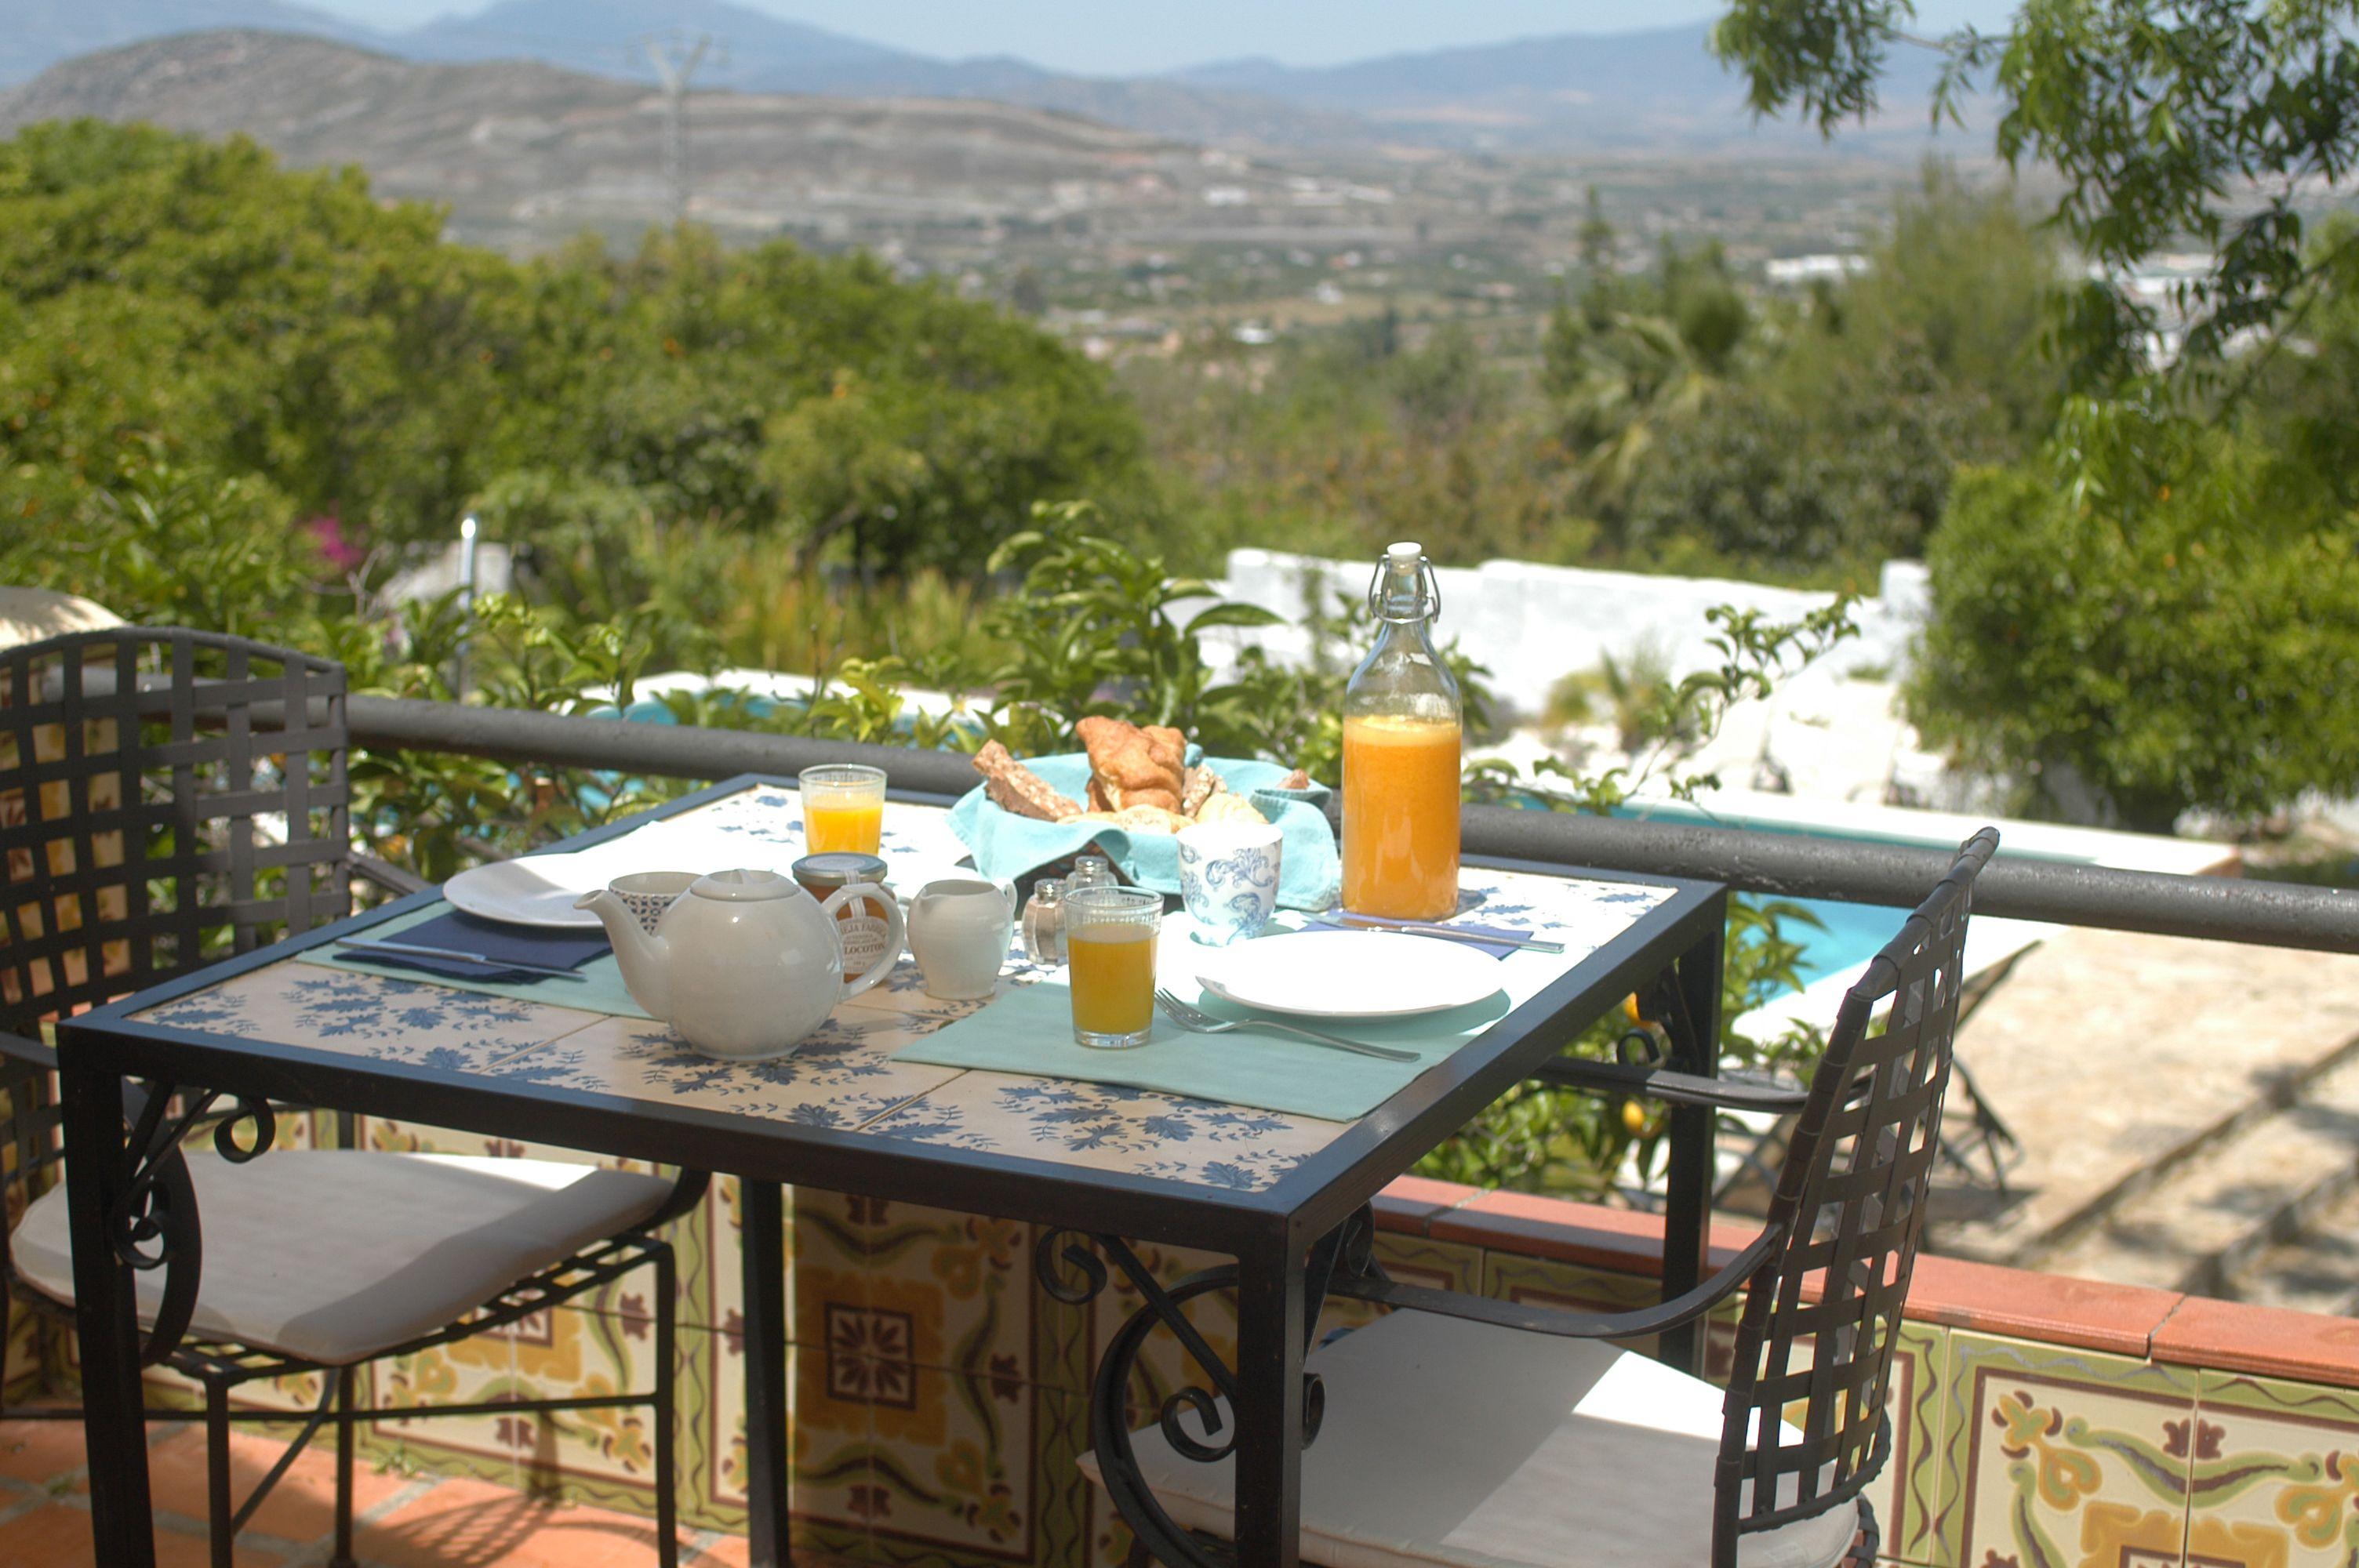 Breakfast @Anita Casalis de Orange